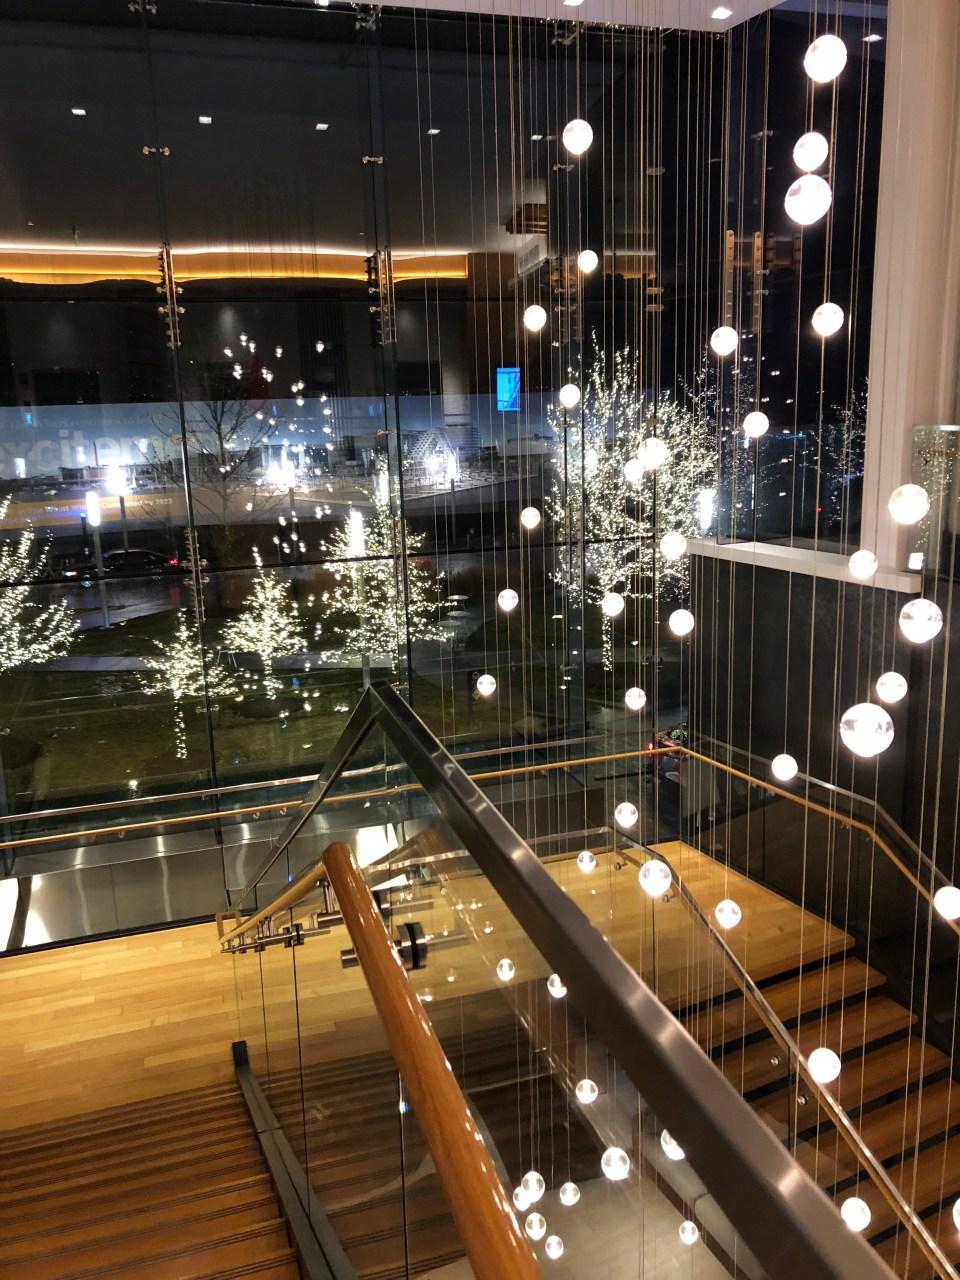 Canopy by Hilton The Wharf - Lobby at night